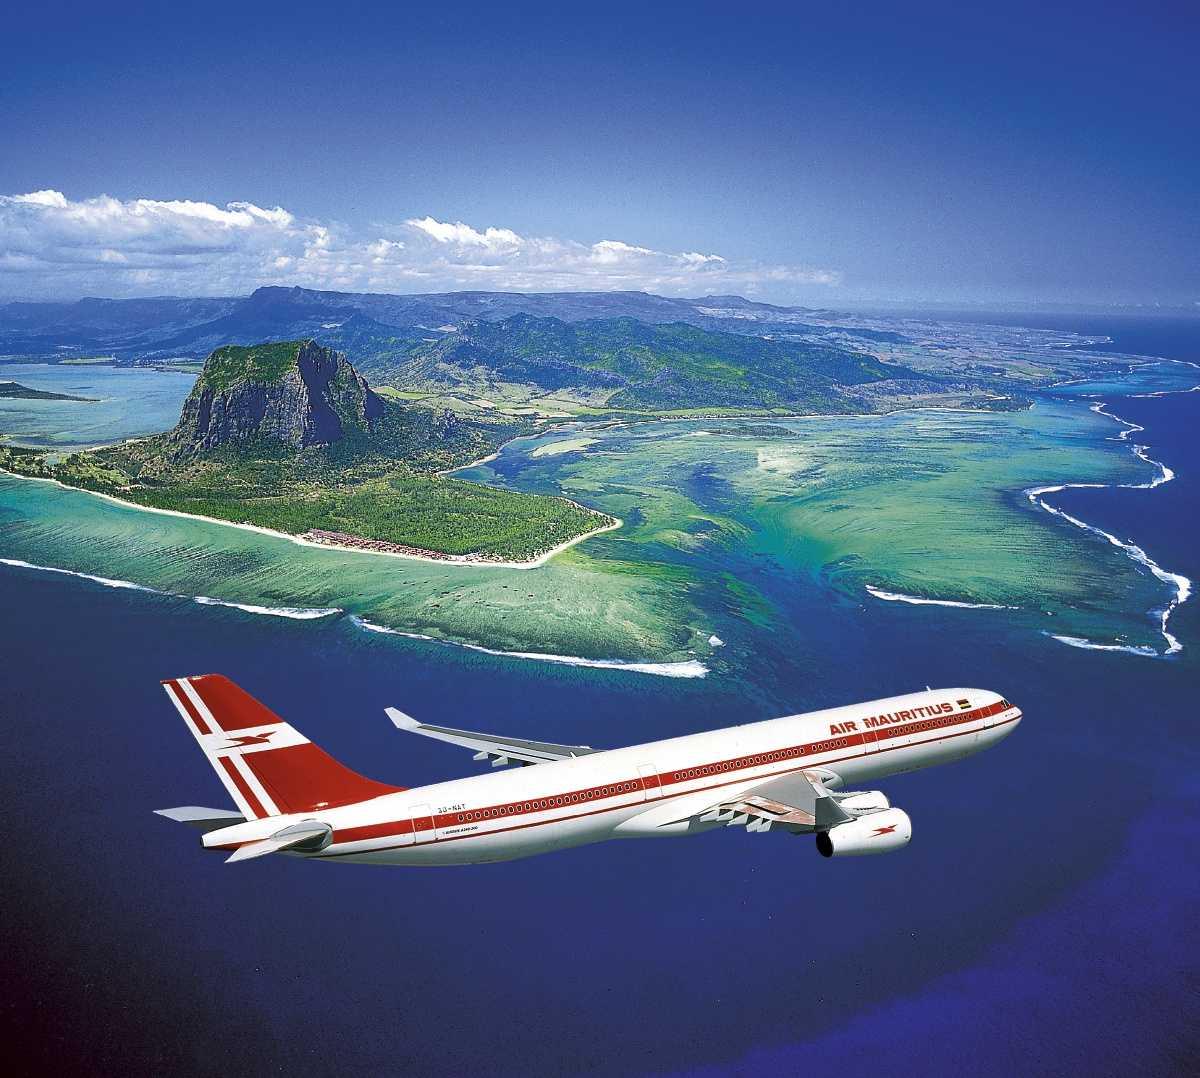 http://4.bp.blogspot.com/-K8sC8Lqm1GU/T7vfsJTVA_I/AAAAAAAAALQ/5IhKXEFxNQk/s1600/Air-Mauritius.jpg